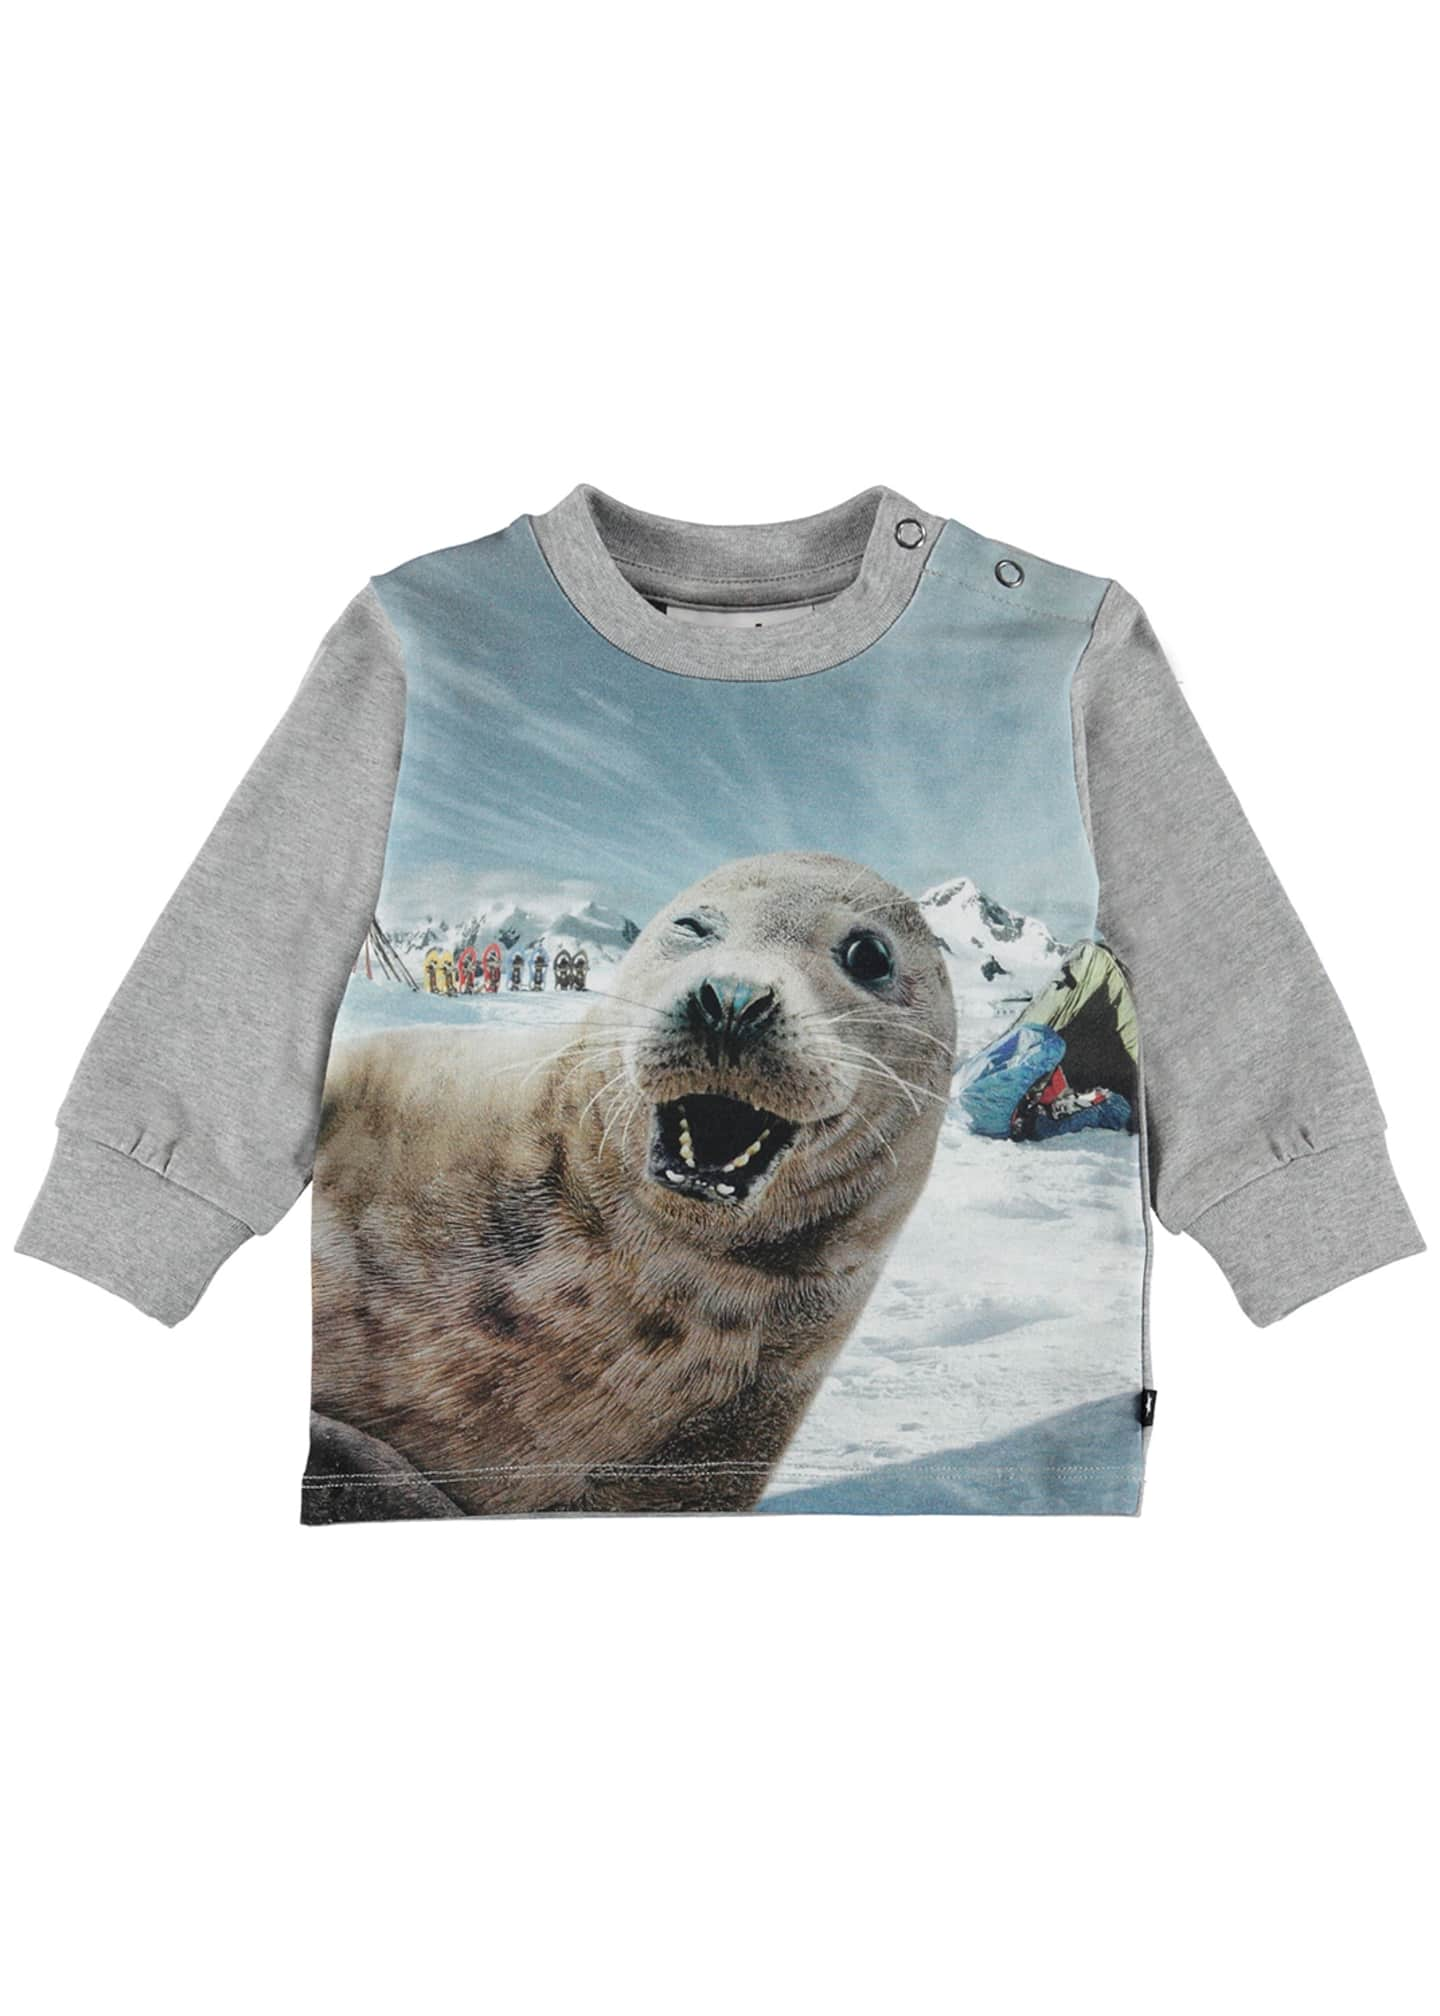 Molo Eloy Seal Selfie Print T-Shirt, Size 6-24